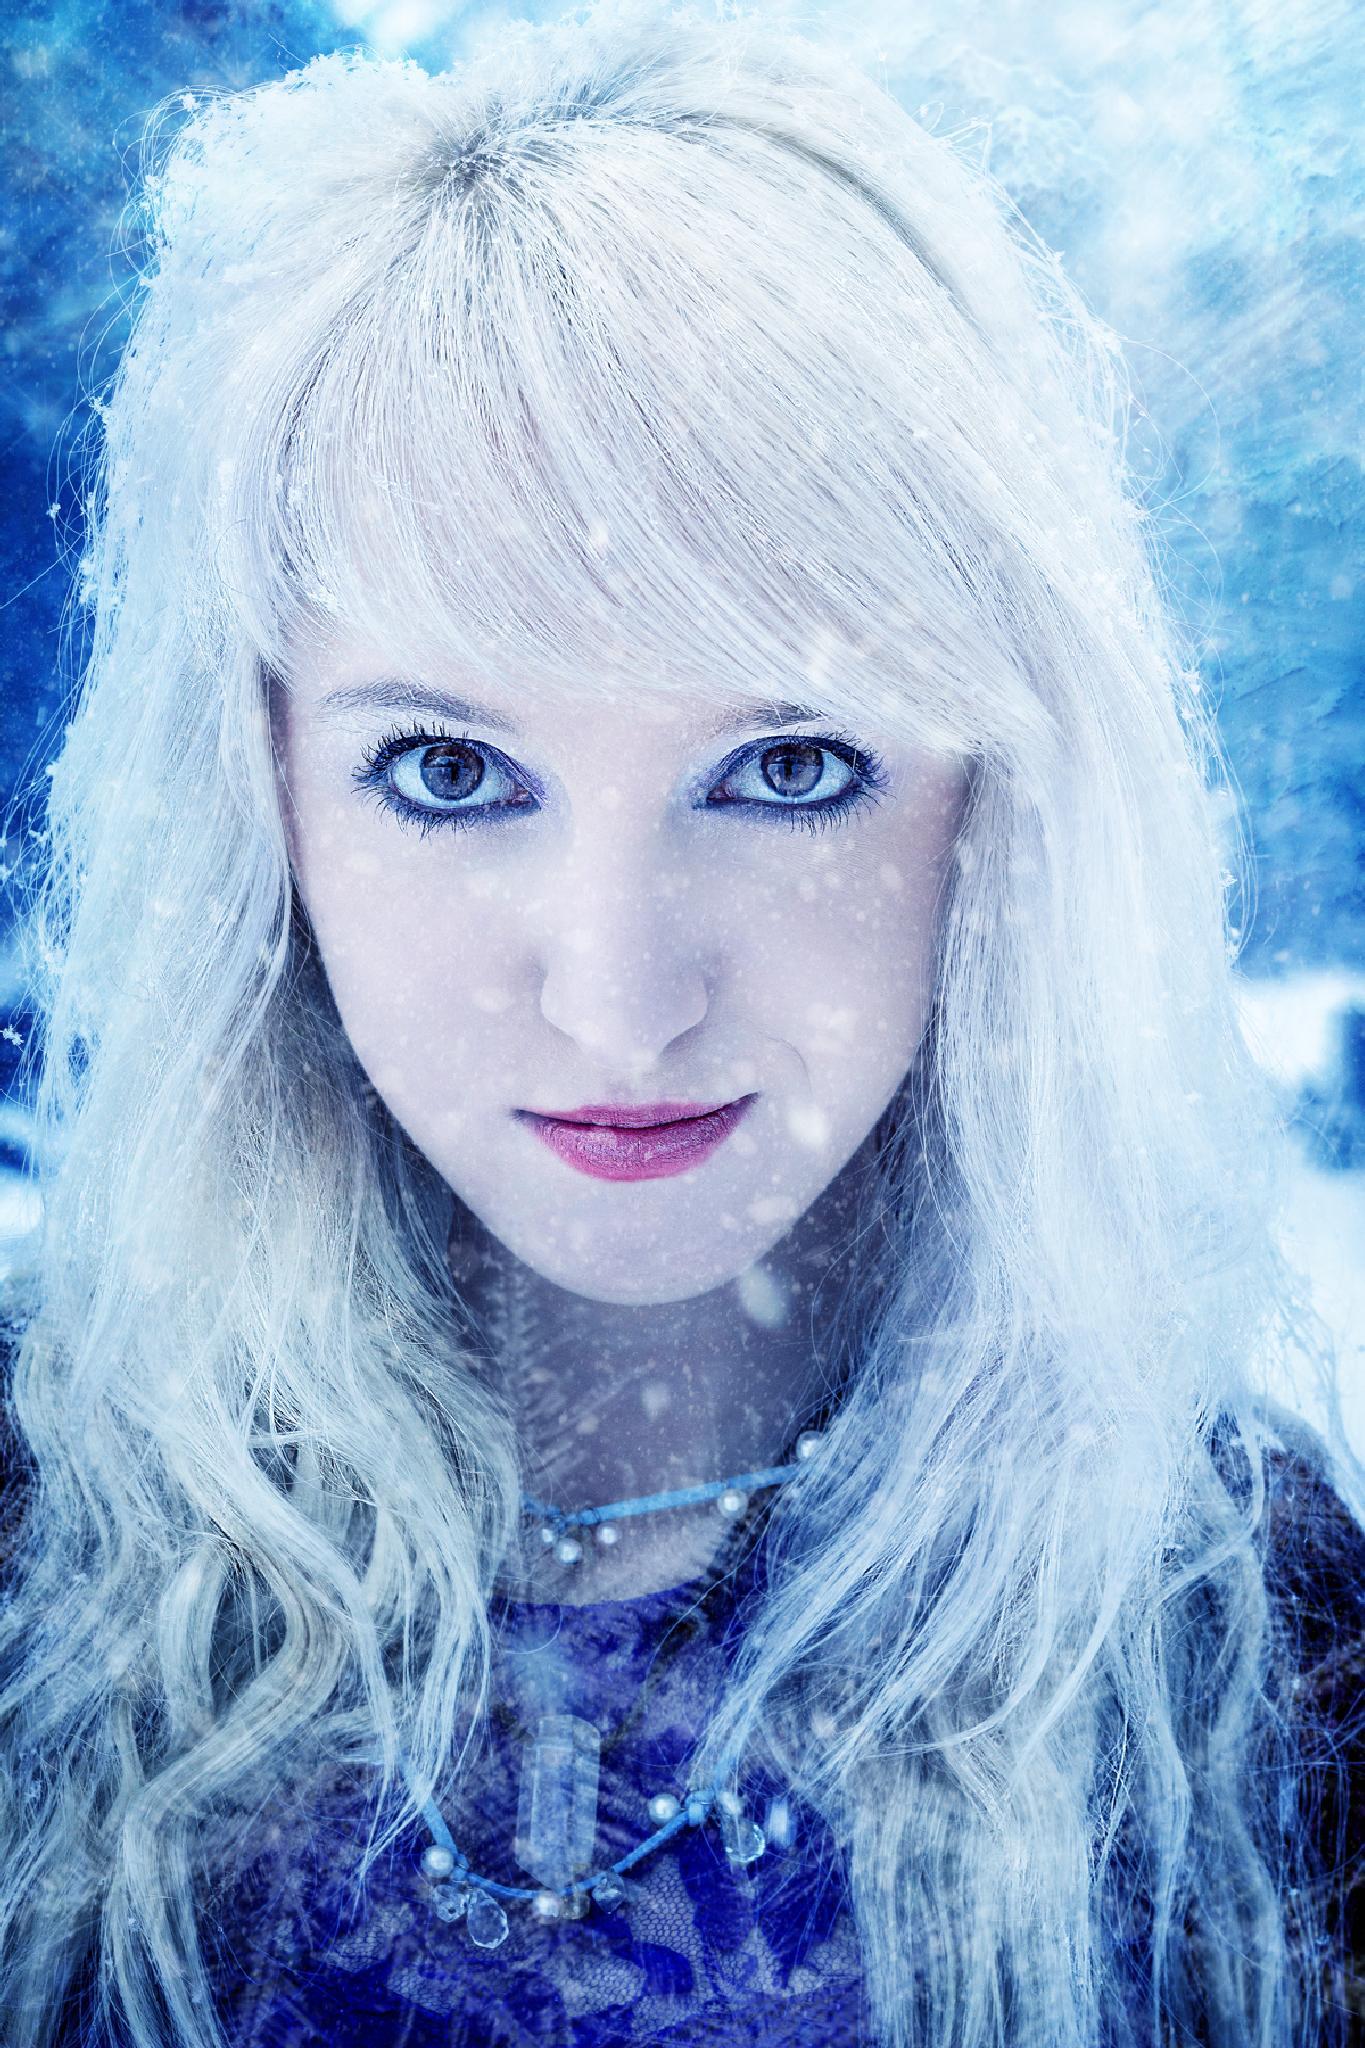 The Ice Queen by Stefan Braas